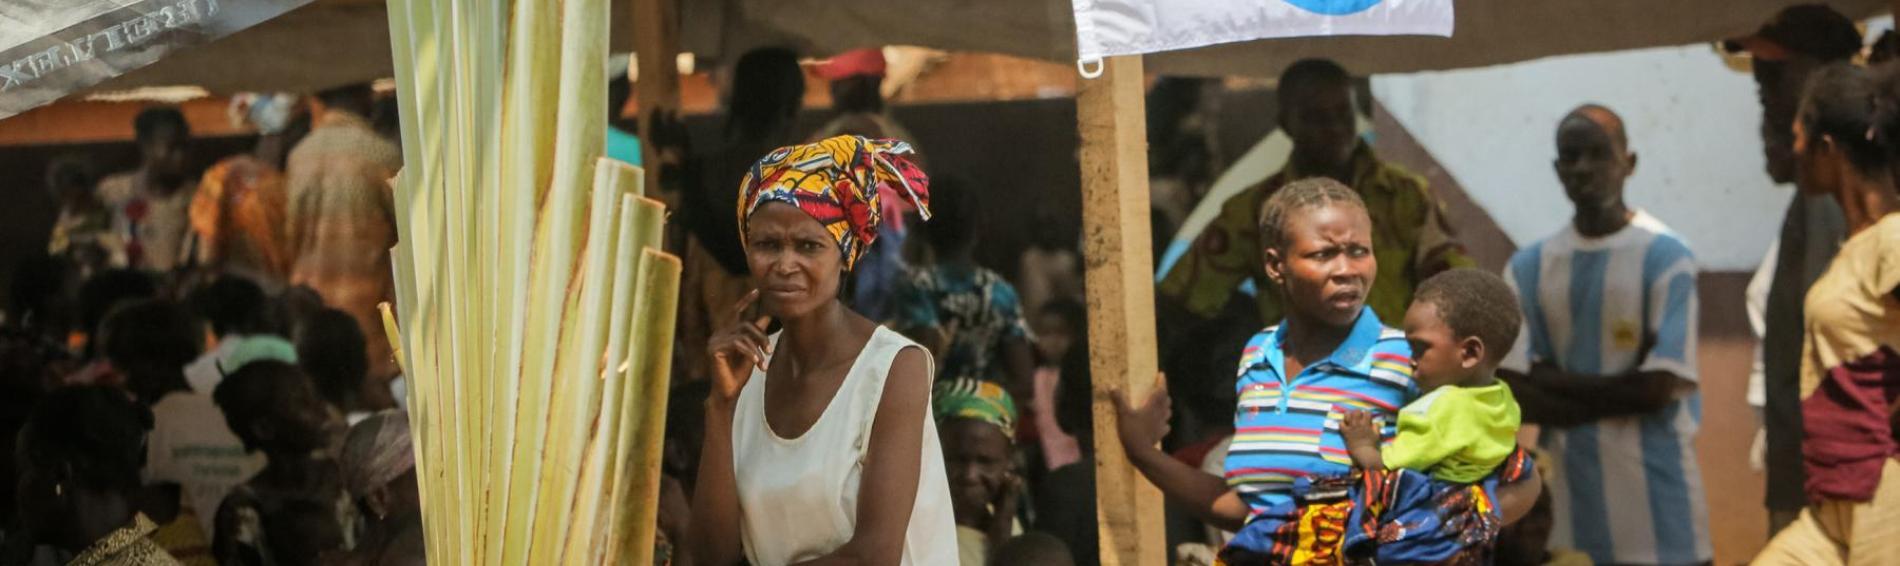 Klinik Gobongo in der Zentralafrikanischen Republik. Foto: Sébastien Dujindam